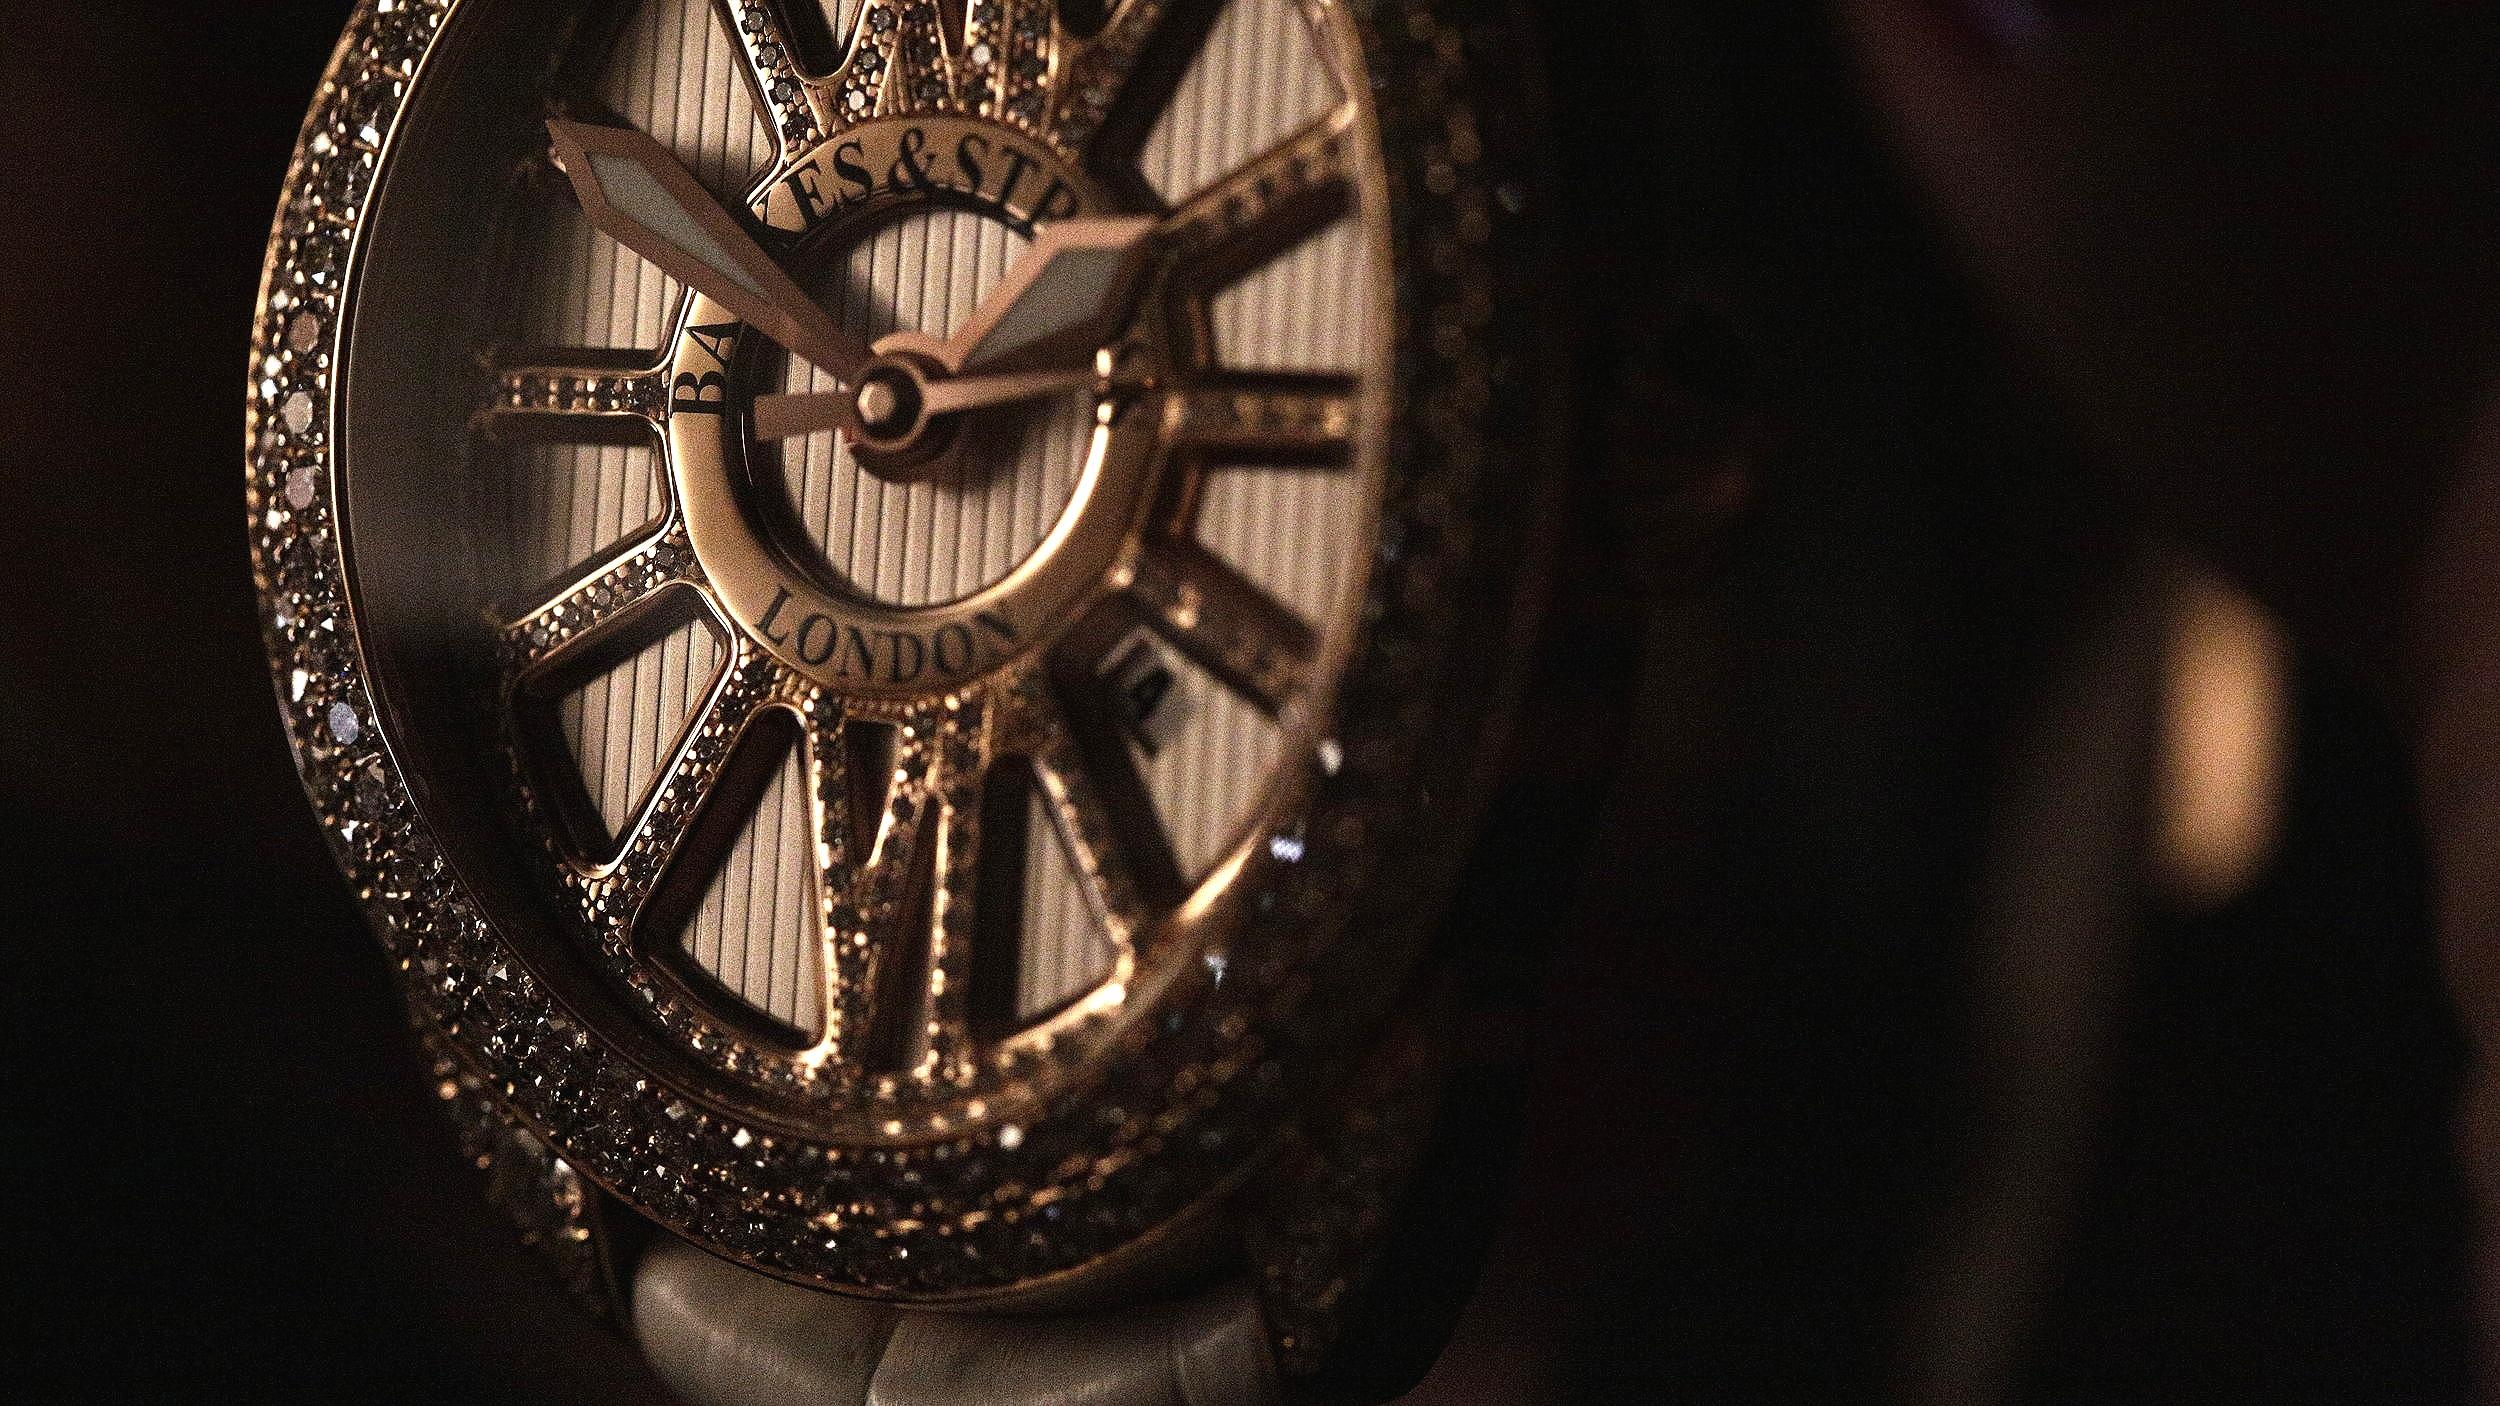 Regent Diamond time 4047 diamond watch